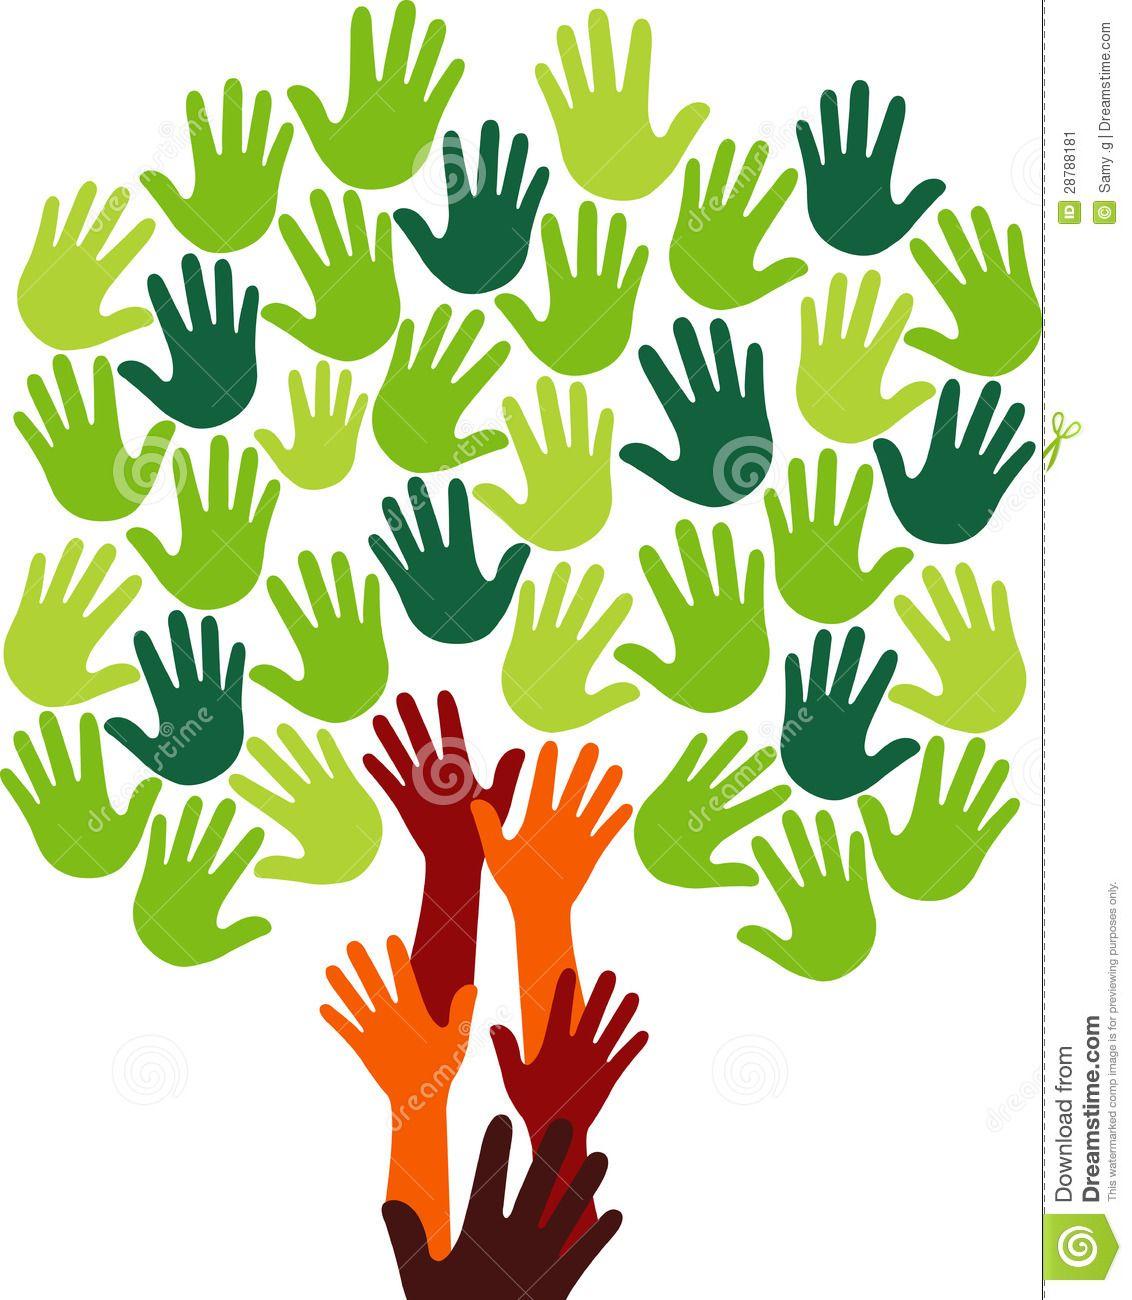 Hands Tree Logo Royalty Free Stock Photo Image 32535265